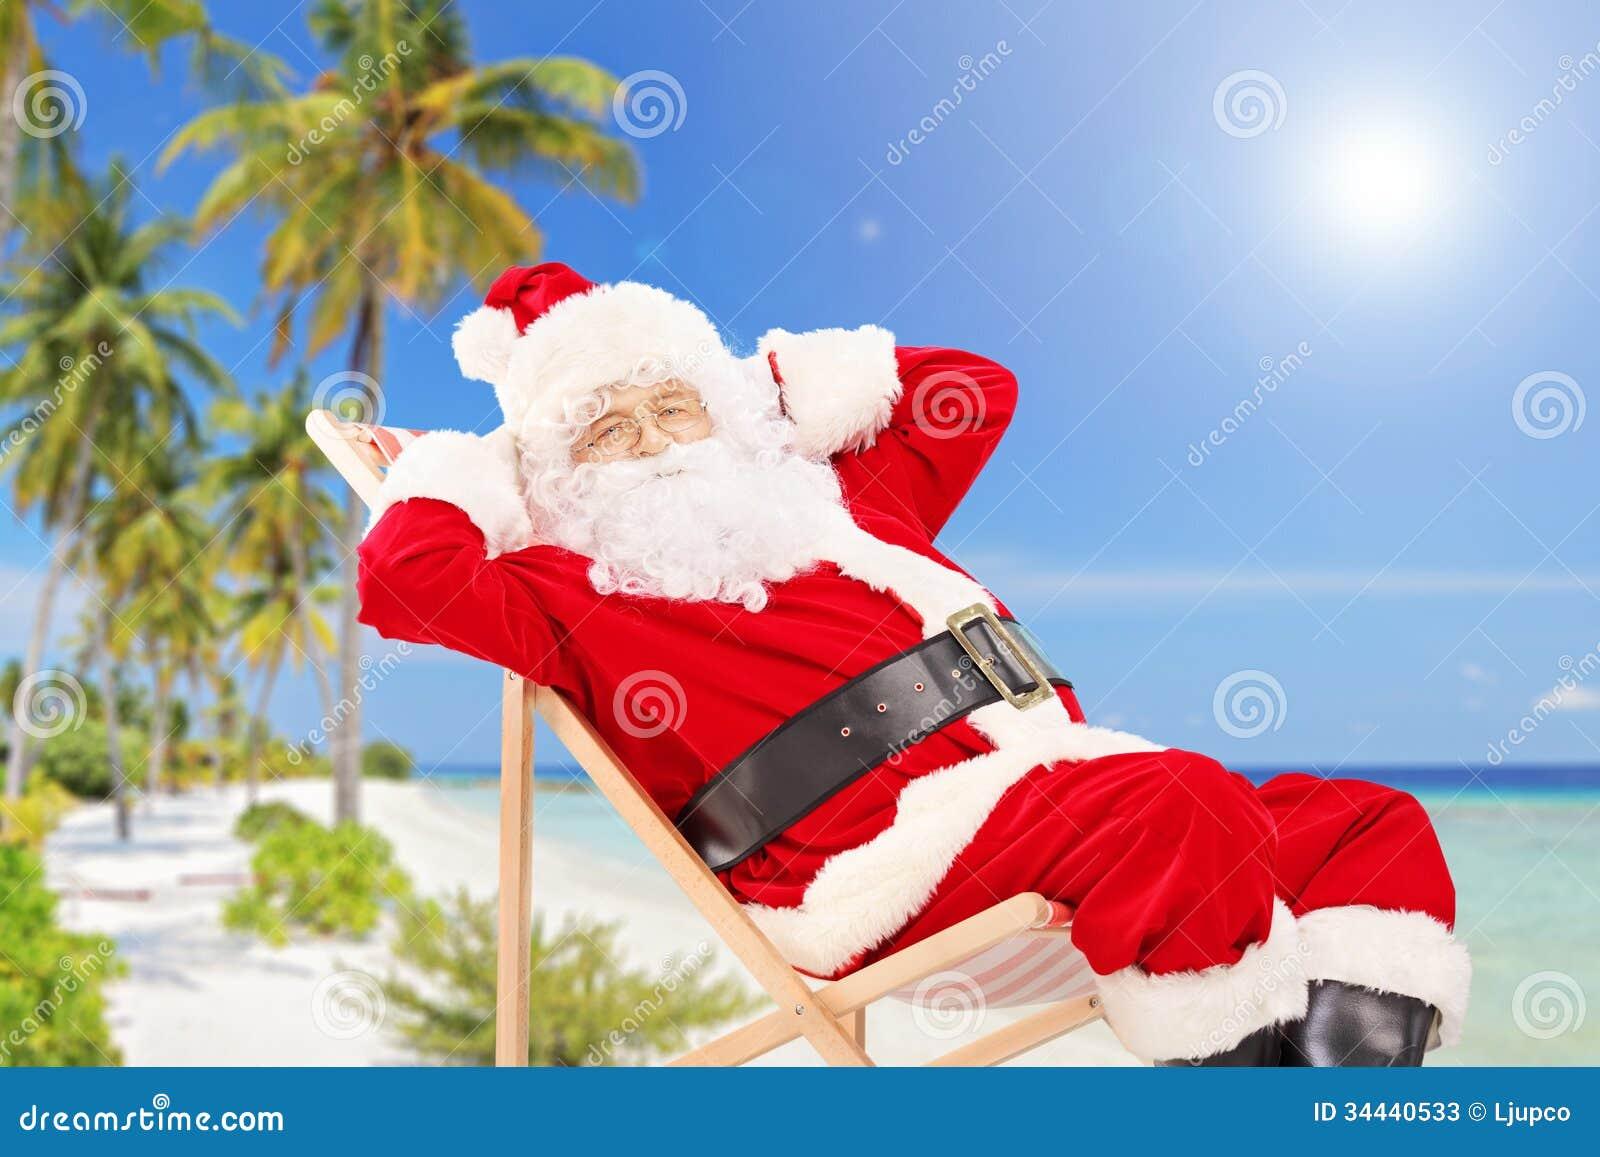 Relaxed Santa Claus sitting on a chair, on a tropical beach, enjoying ...